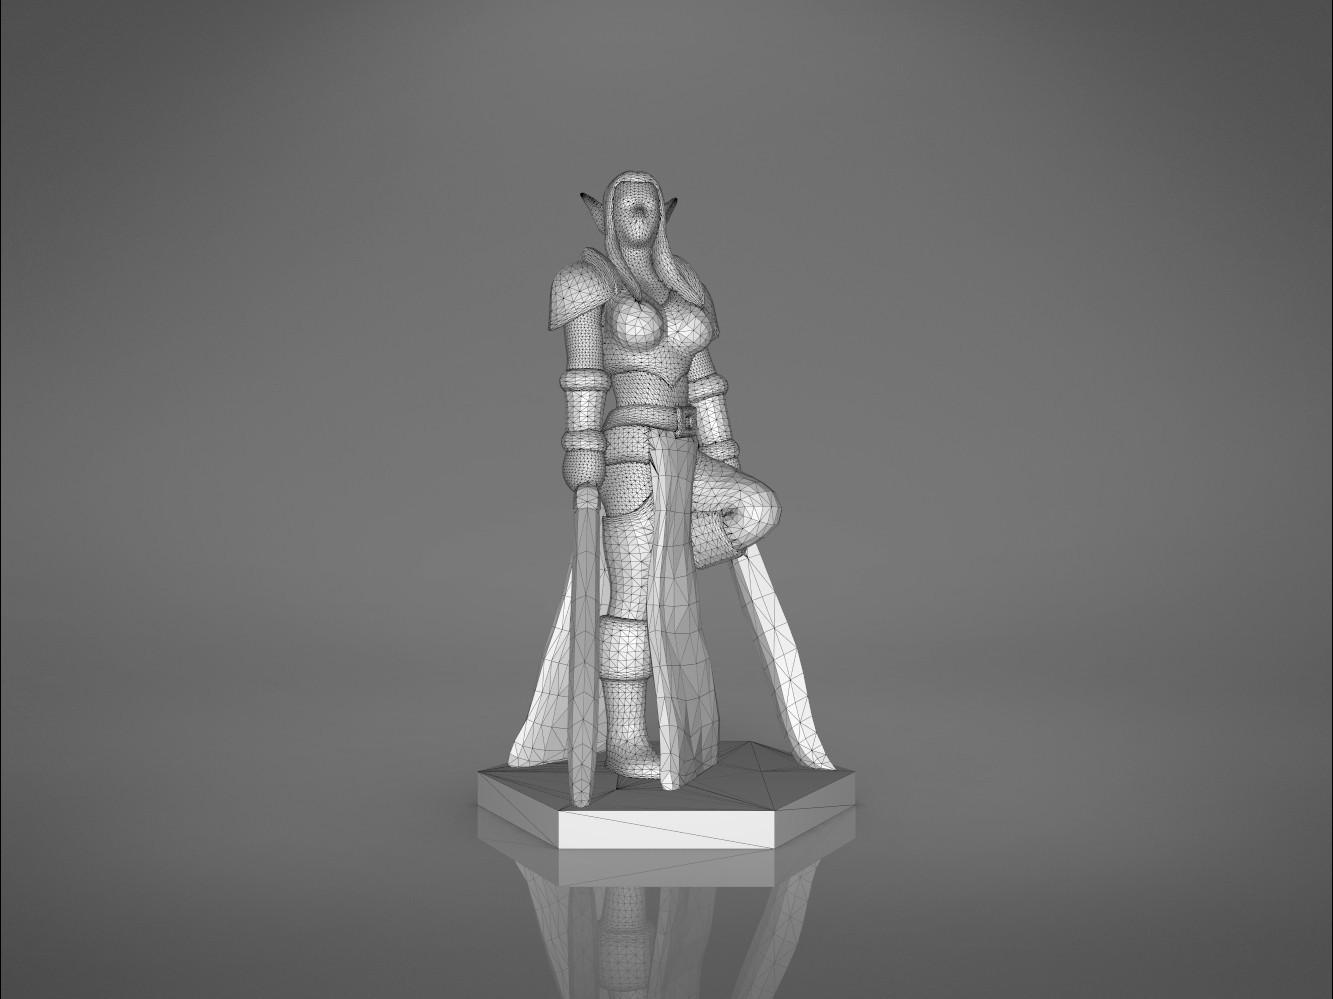 Warrior_2-front_perspective.337.jpg Download STL file ELF WARRIOR FEMALE CHARACTER GAME FIGURE 3D print model • 3D printing object, 3D-mon